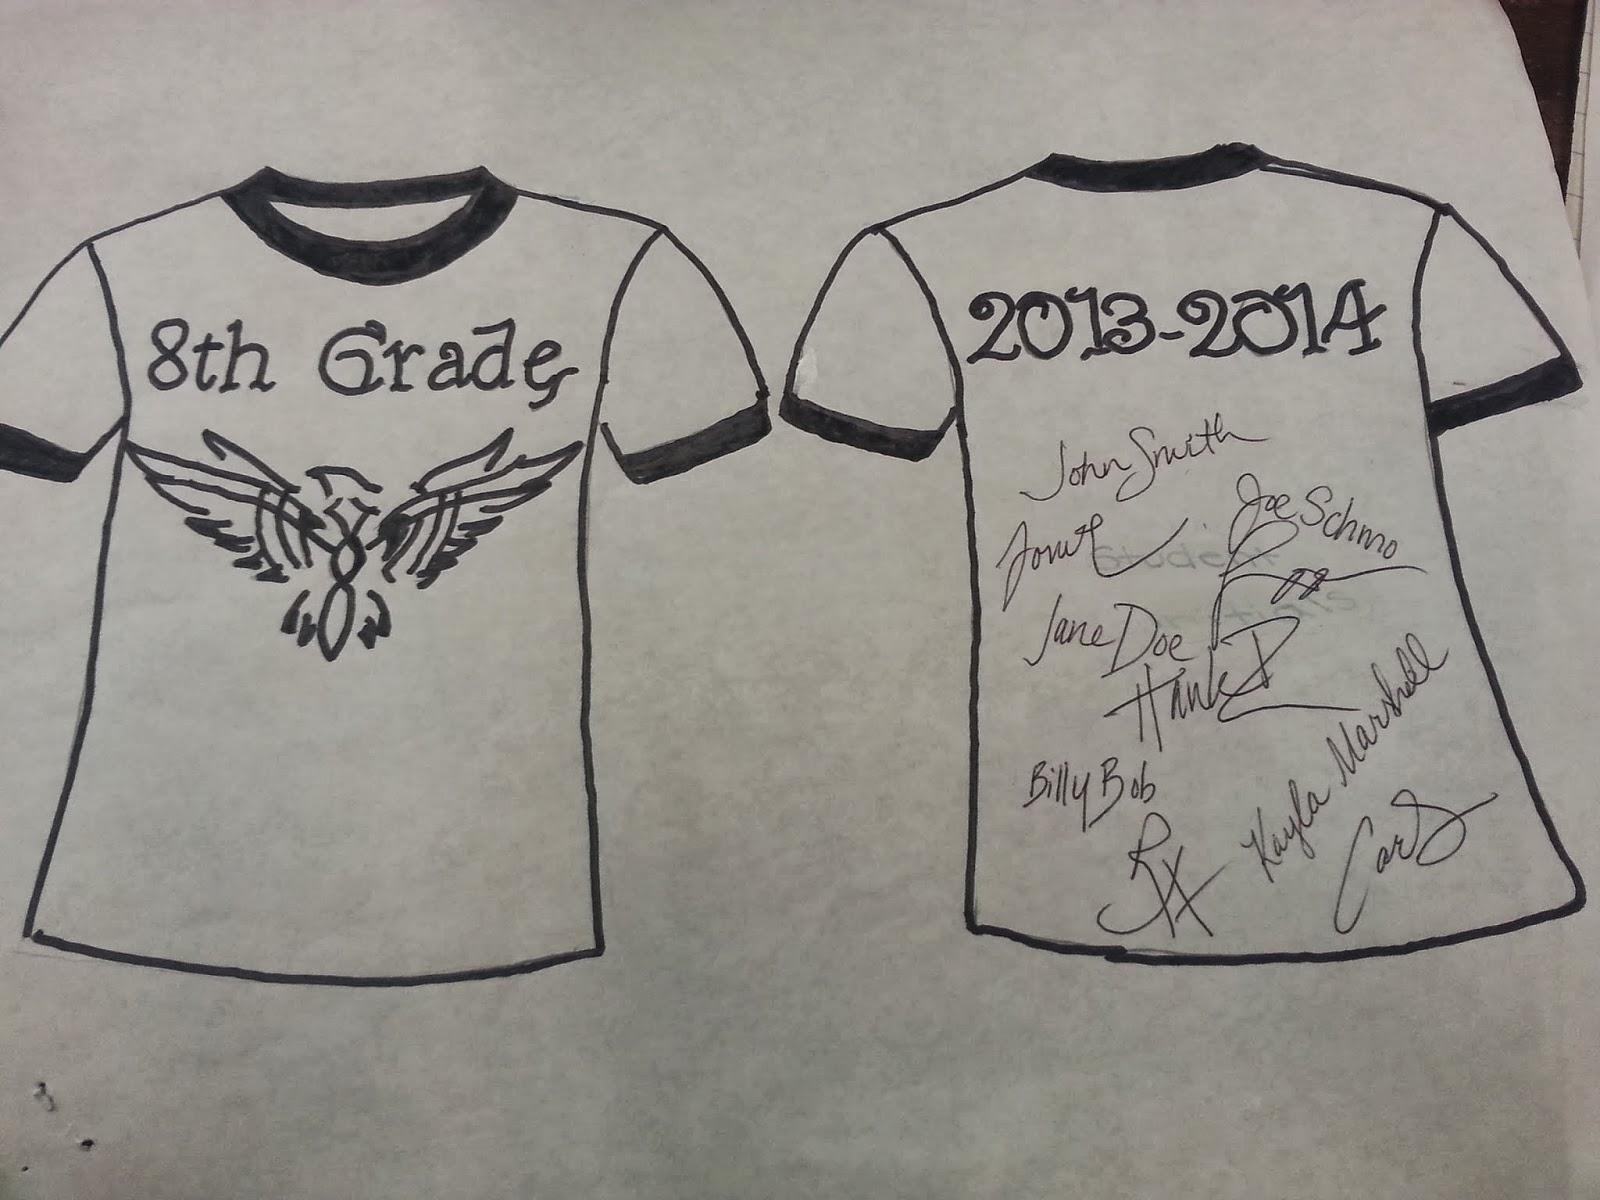 Shirt design ideas for school - Shirt Design Ideas For School 72